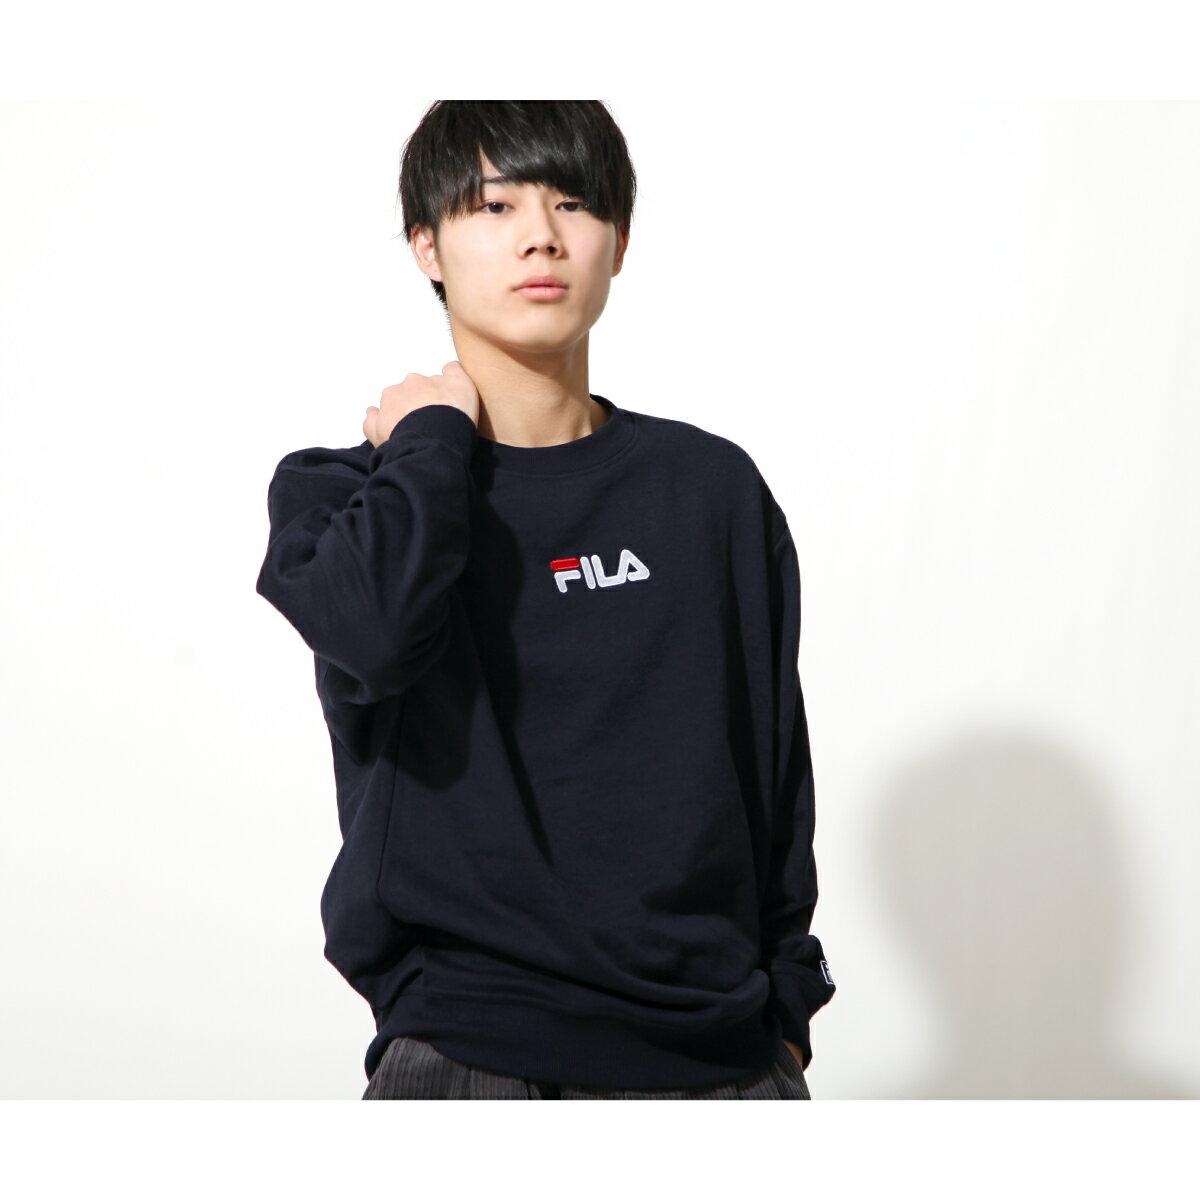 【FILA】單點LOGO刺繡圓領運動衫 1